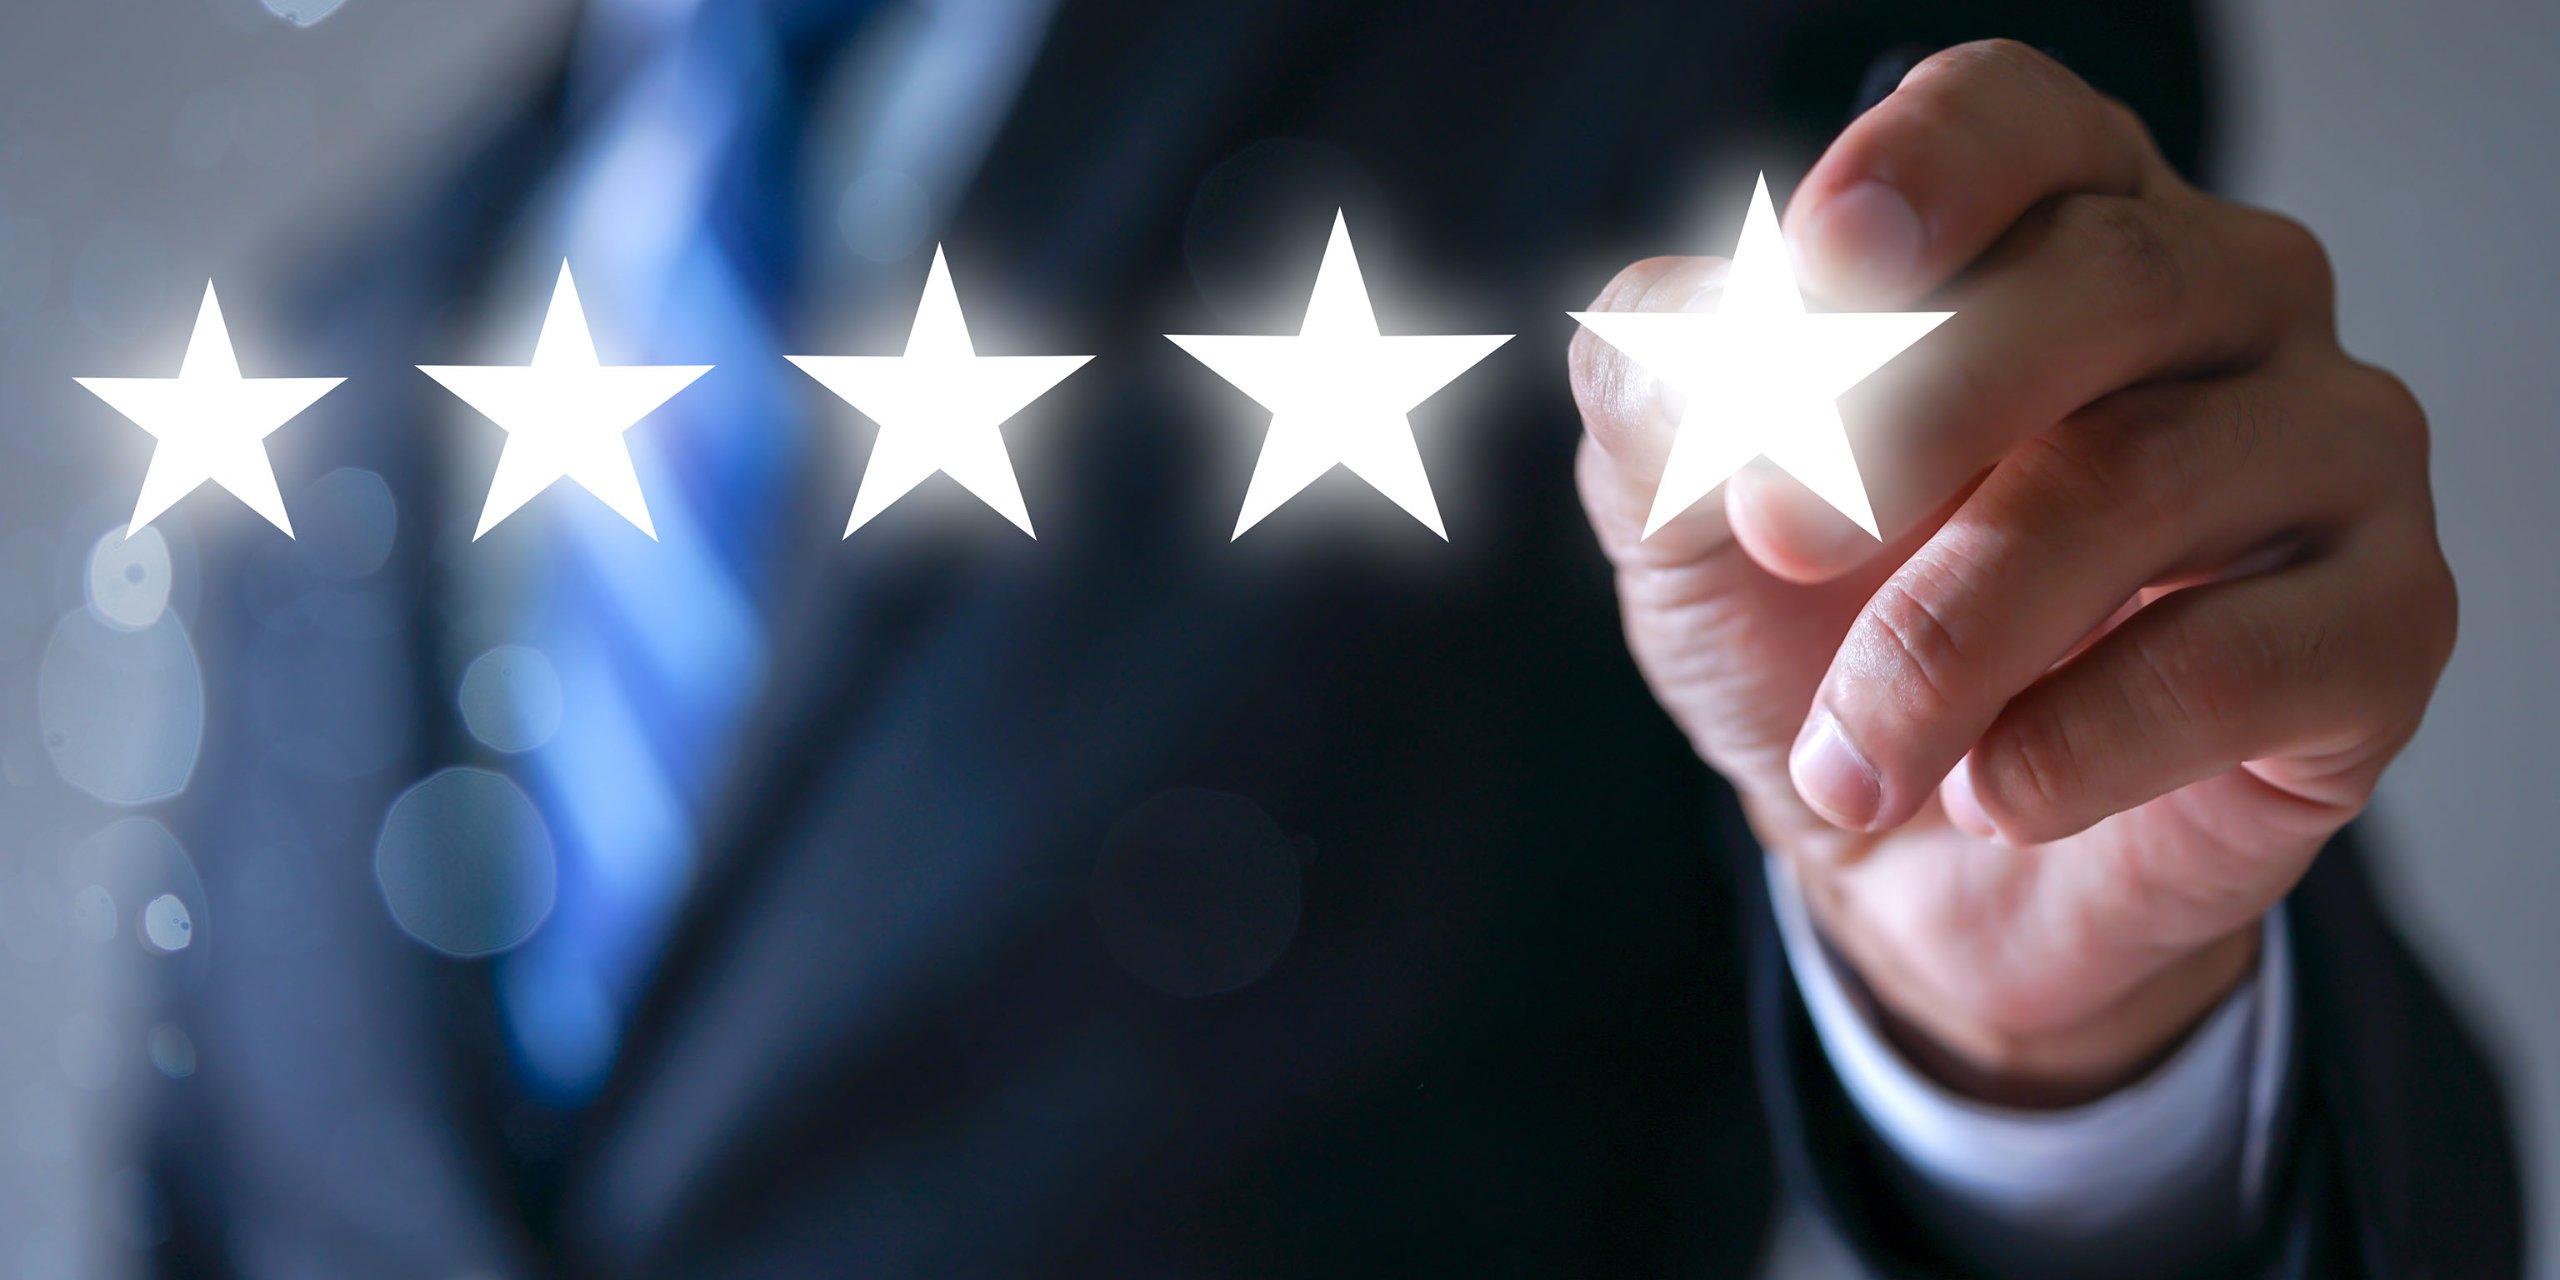 5 stars business man